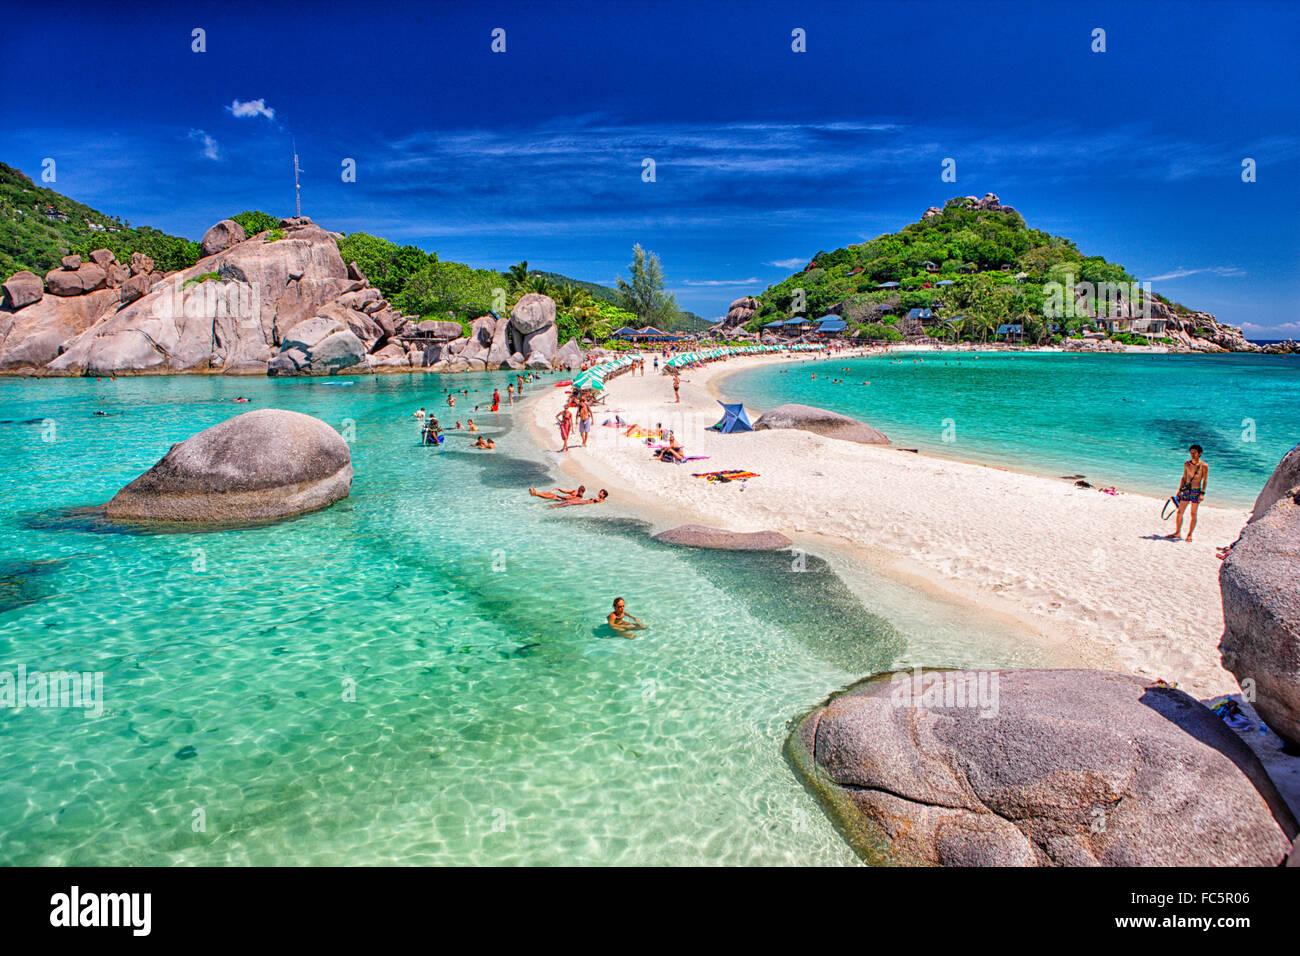 Ko Nang Yuan Island, Koh Tao, Koh Samui, Thailand Stock Photo, Royalty Free I...